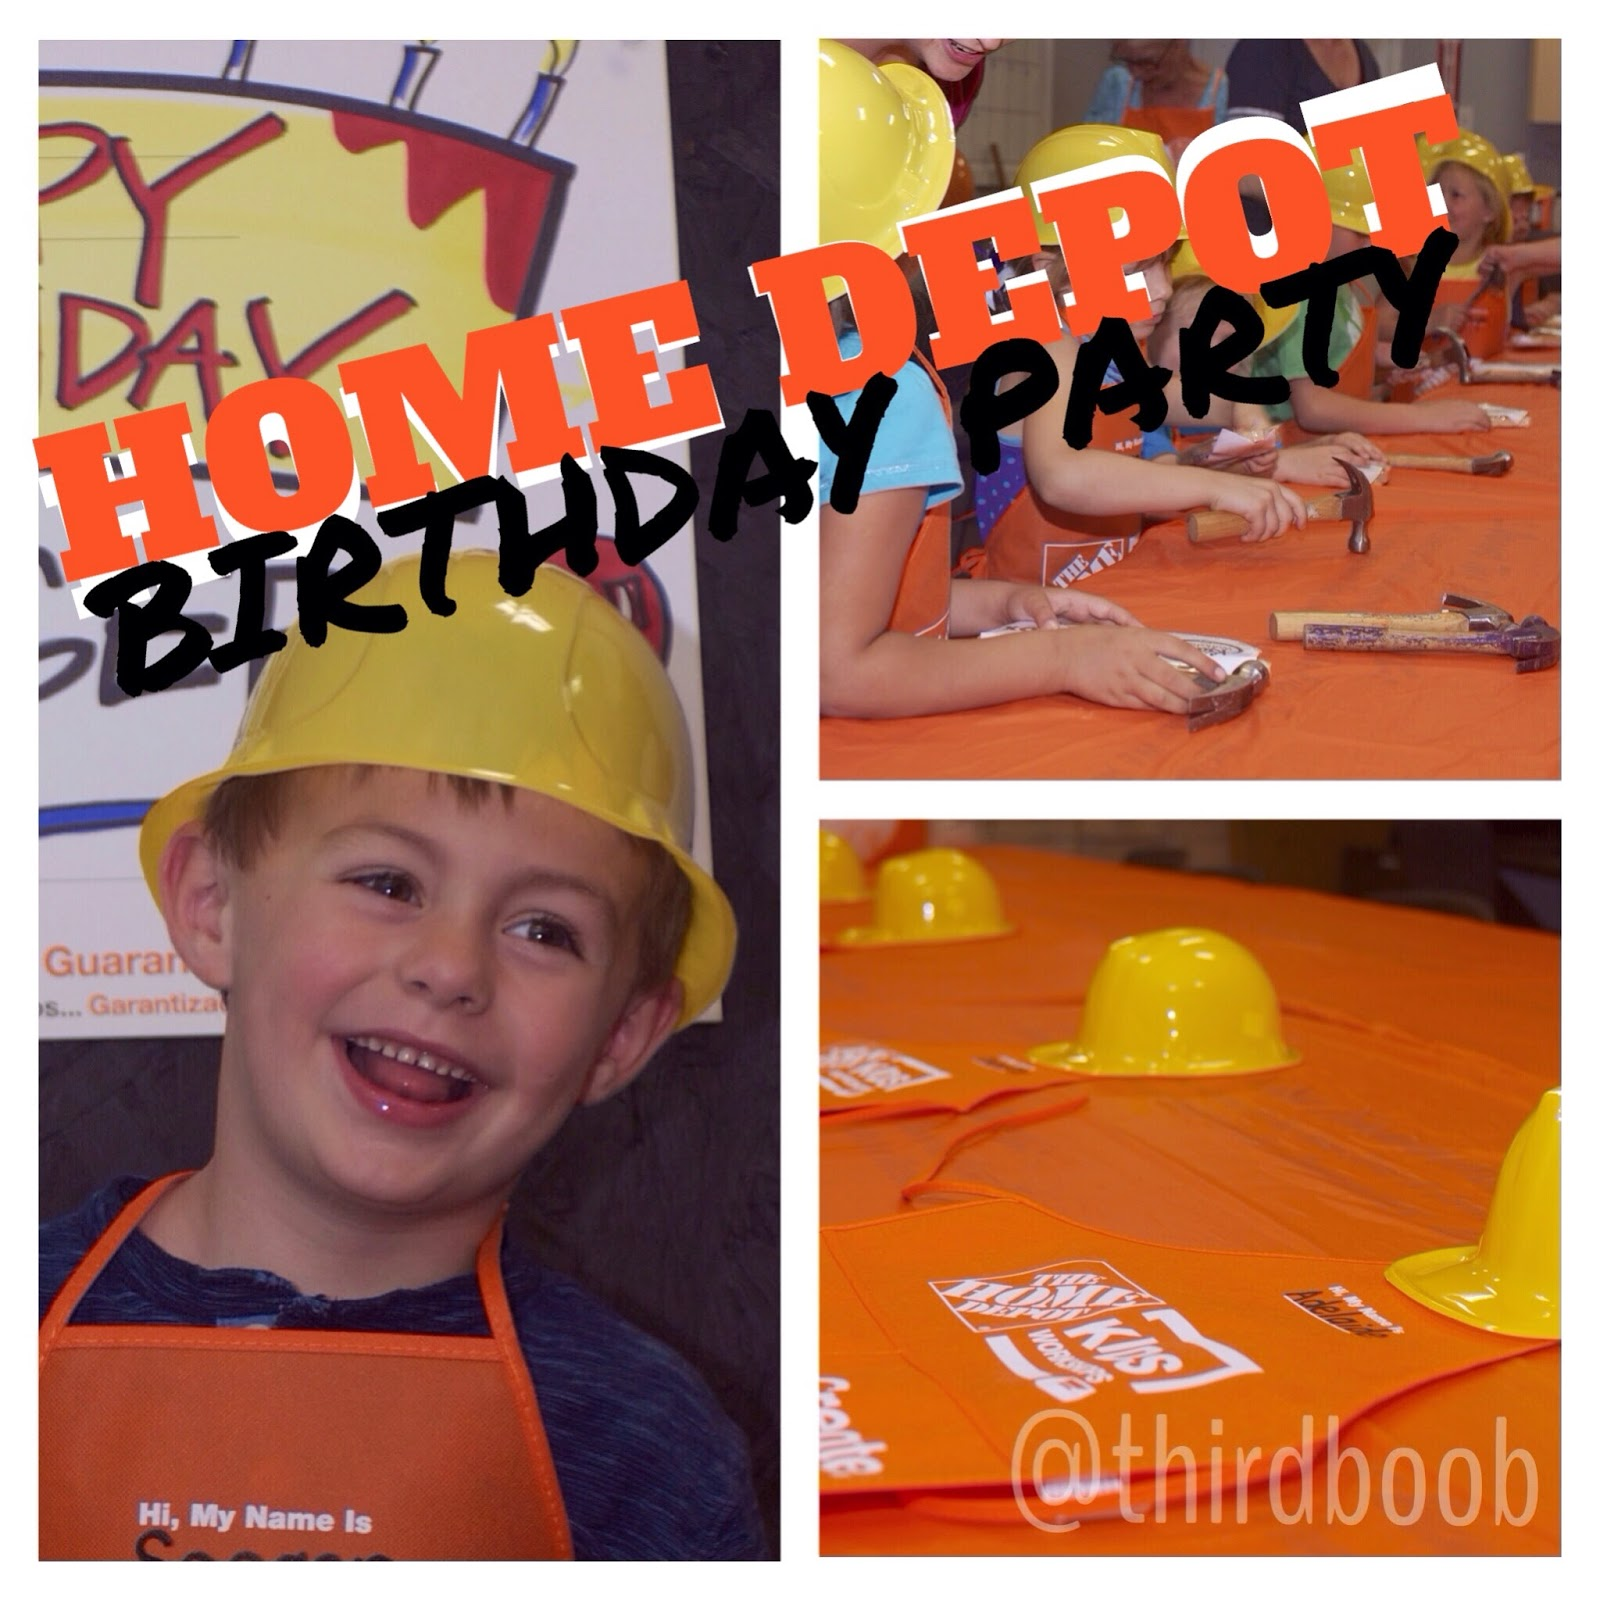 The Third Boob Celebration Home Depot Birthday Party